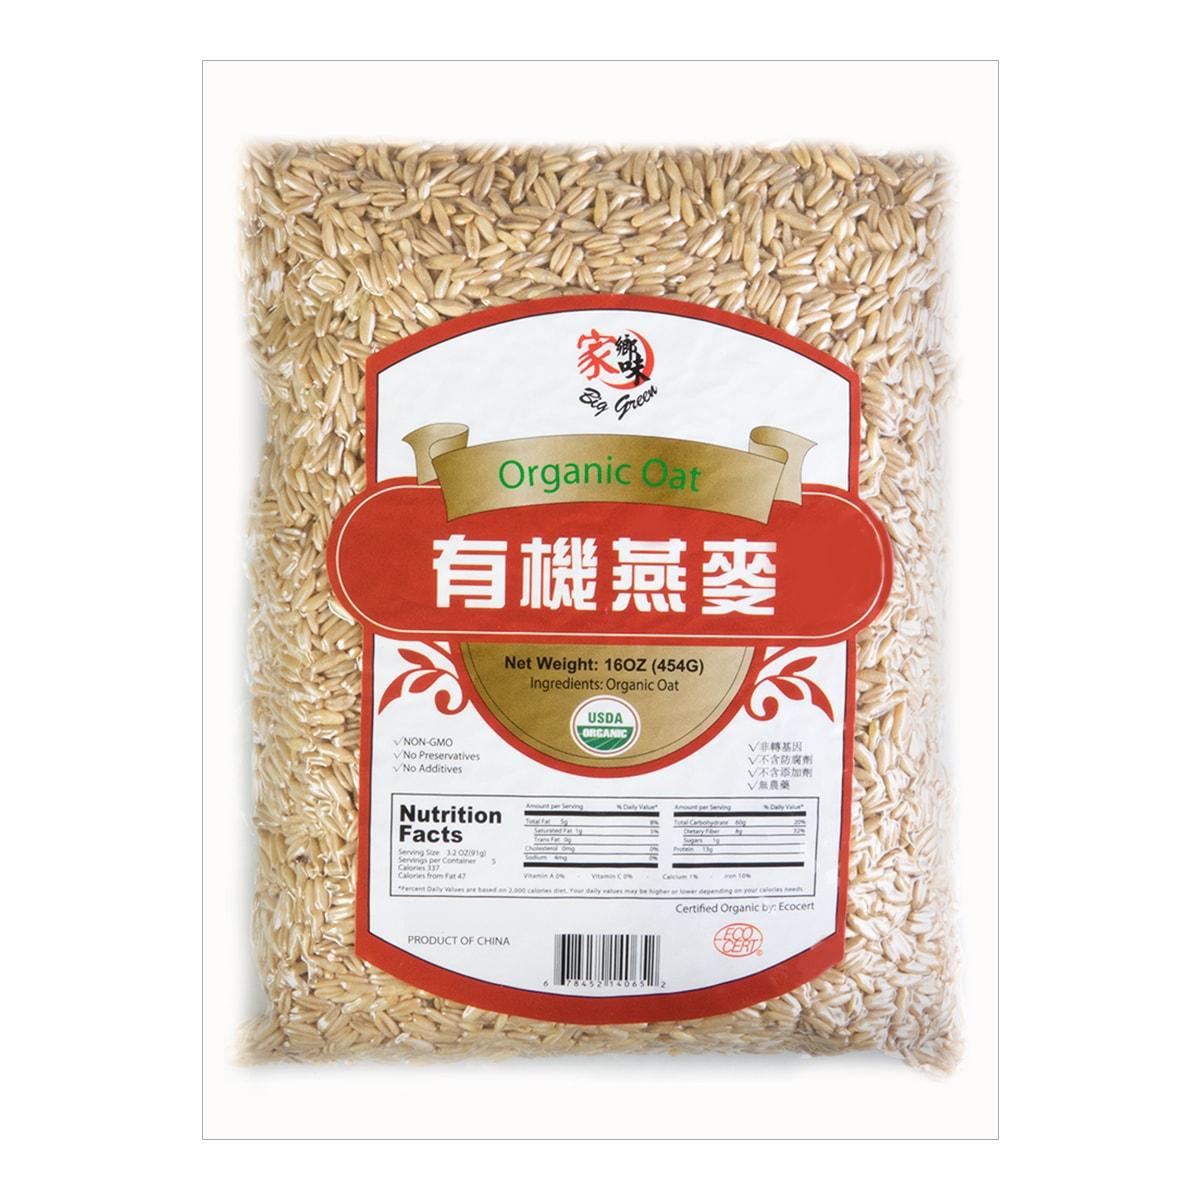 BIG GREEN Organic Oat 454g USDA